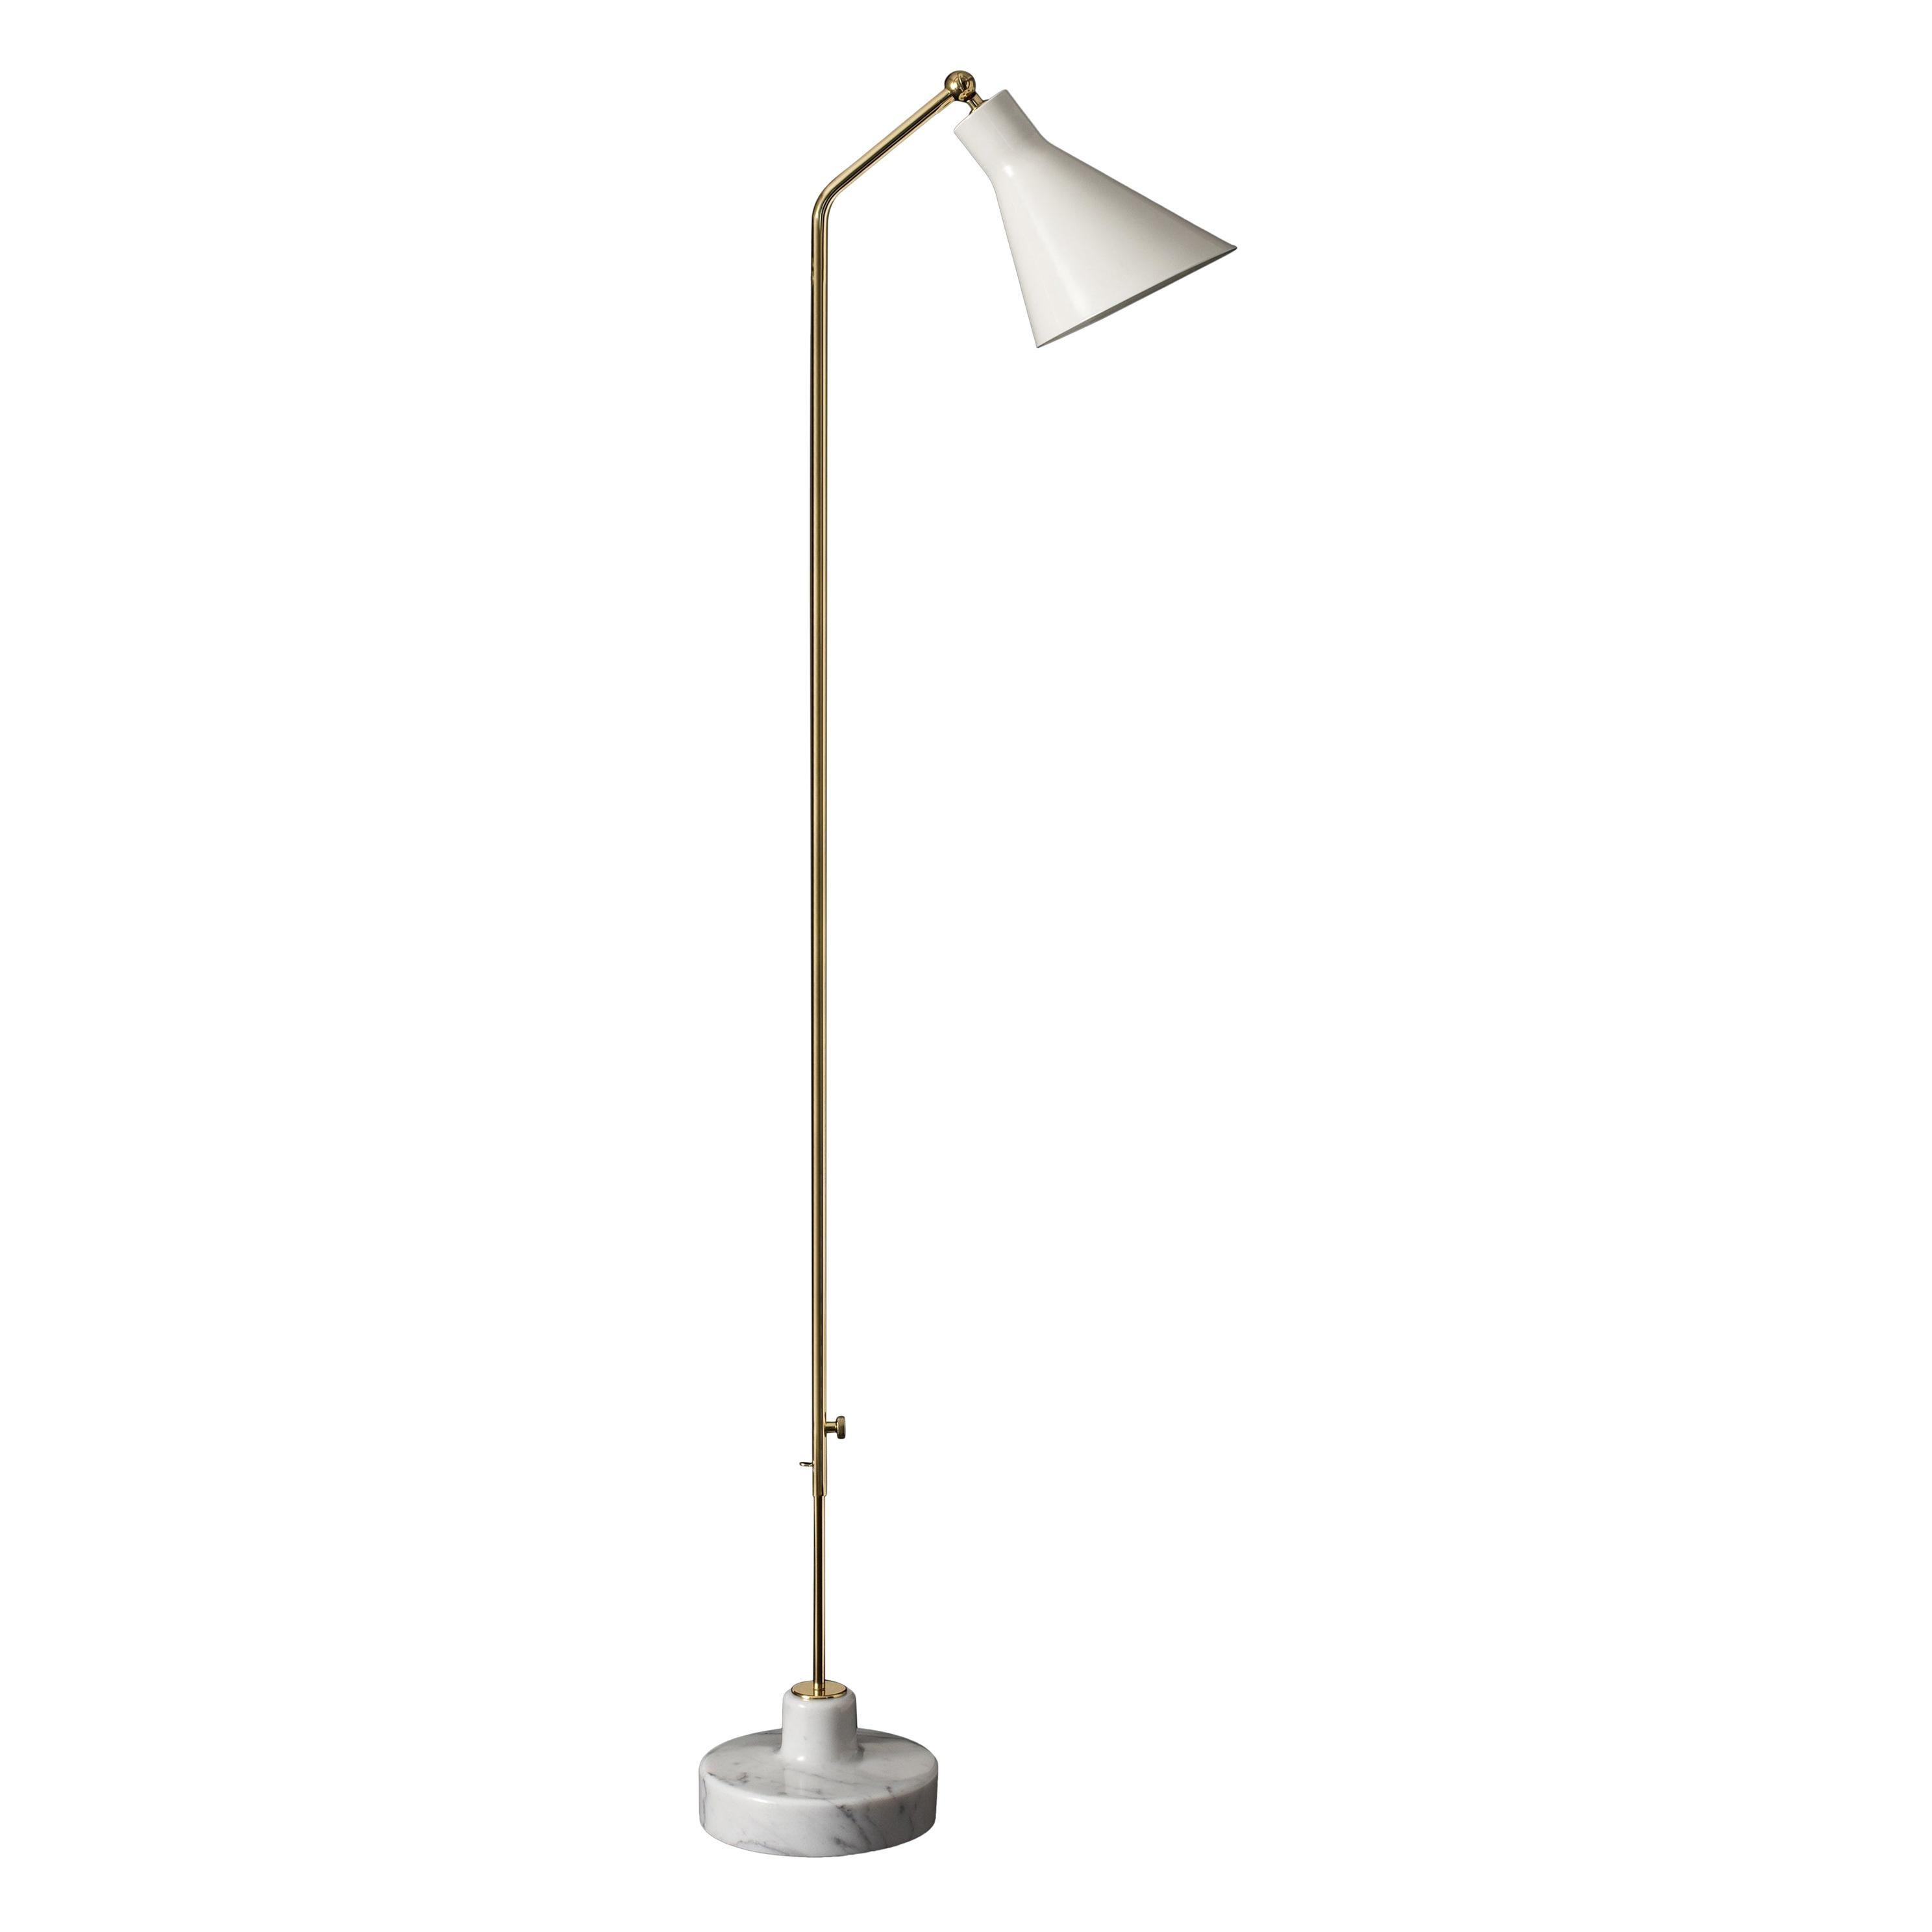 Ignazio Gardella Alzabile Floor Lamp in Brass, White Metal and Marble